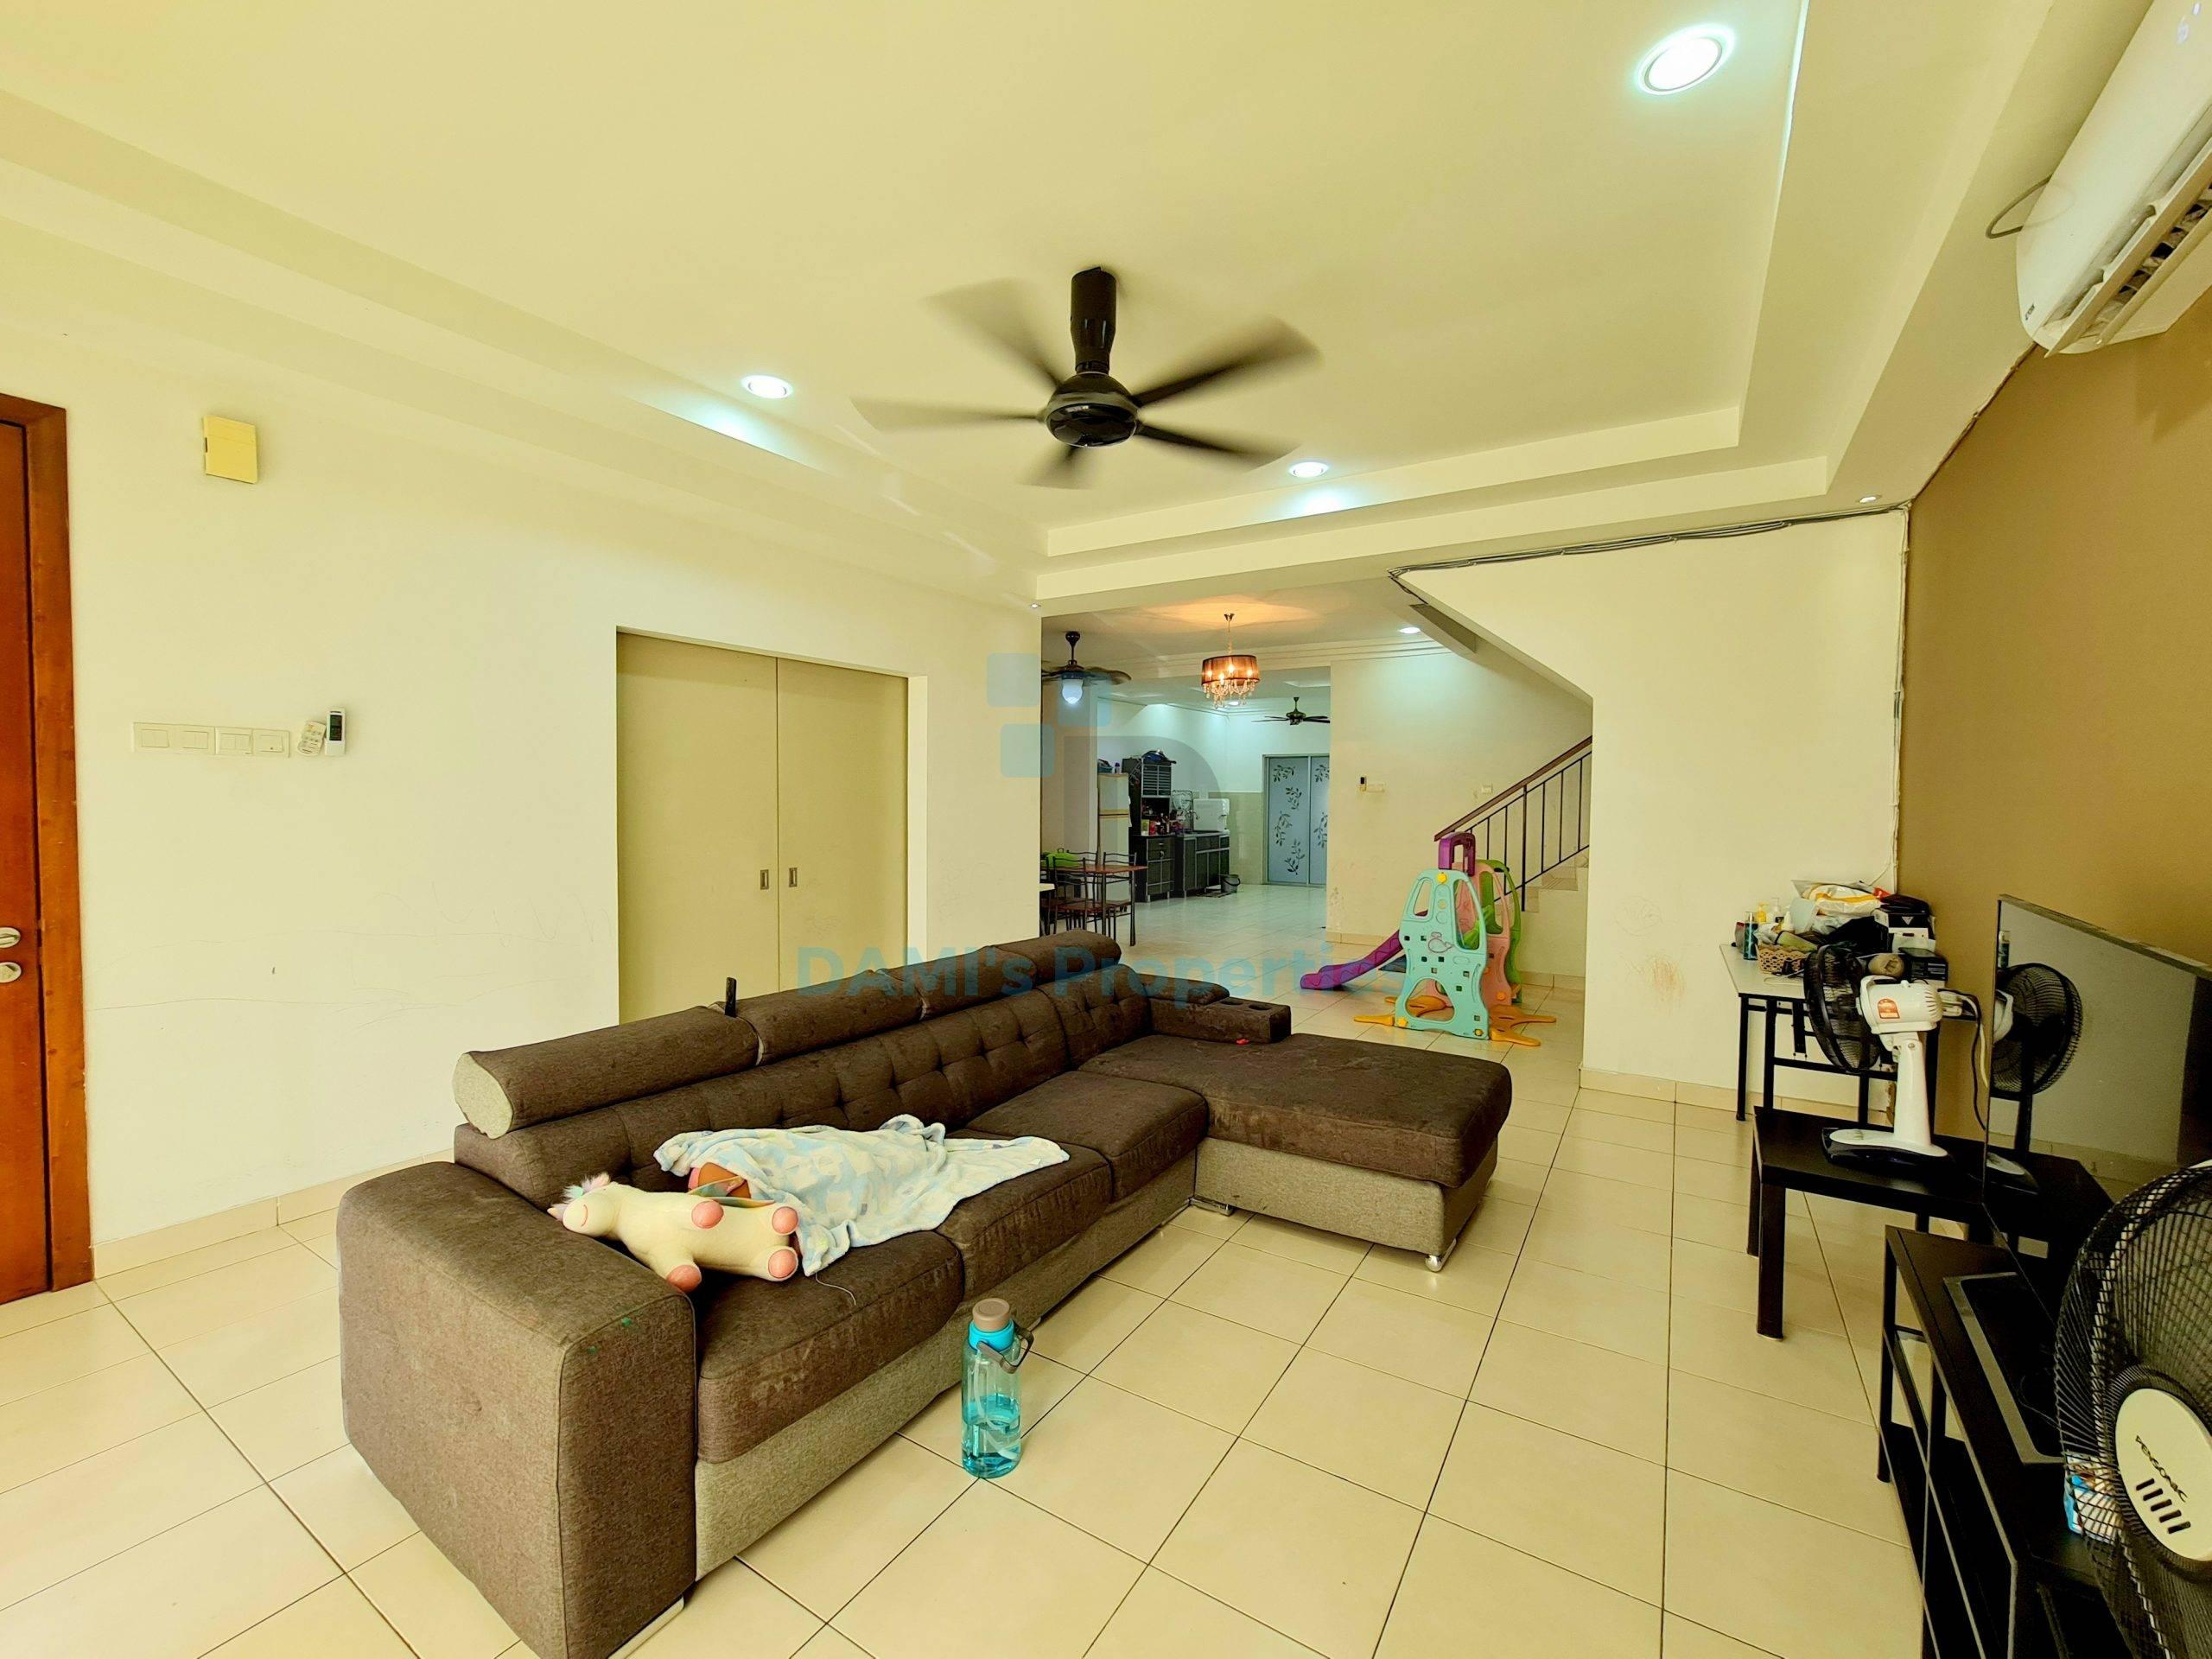 For Sale : 2 Storey Terrace, Bandar Seri Coalfields, Sungai Buloh